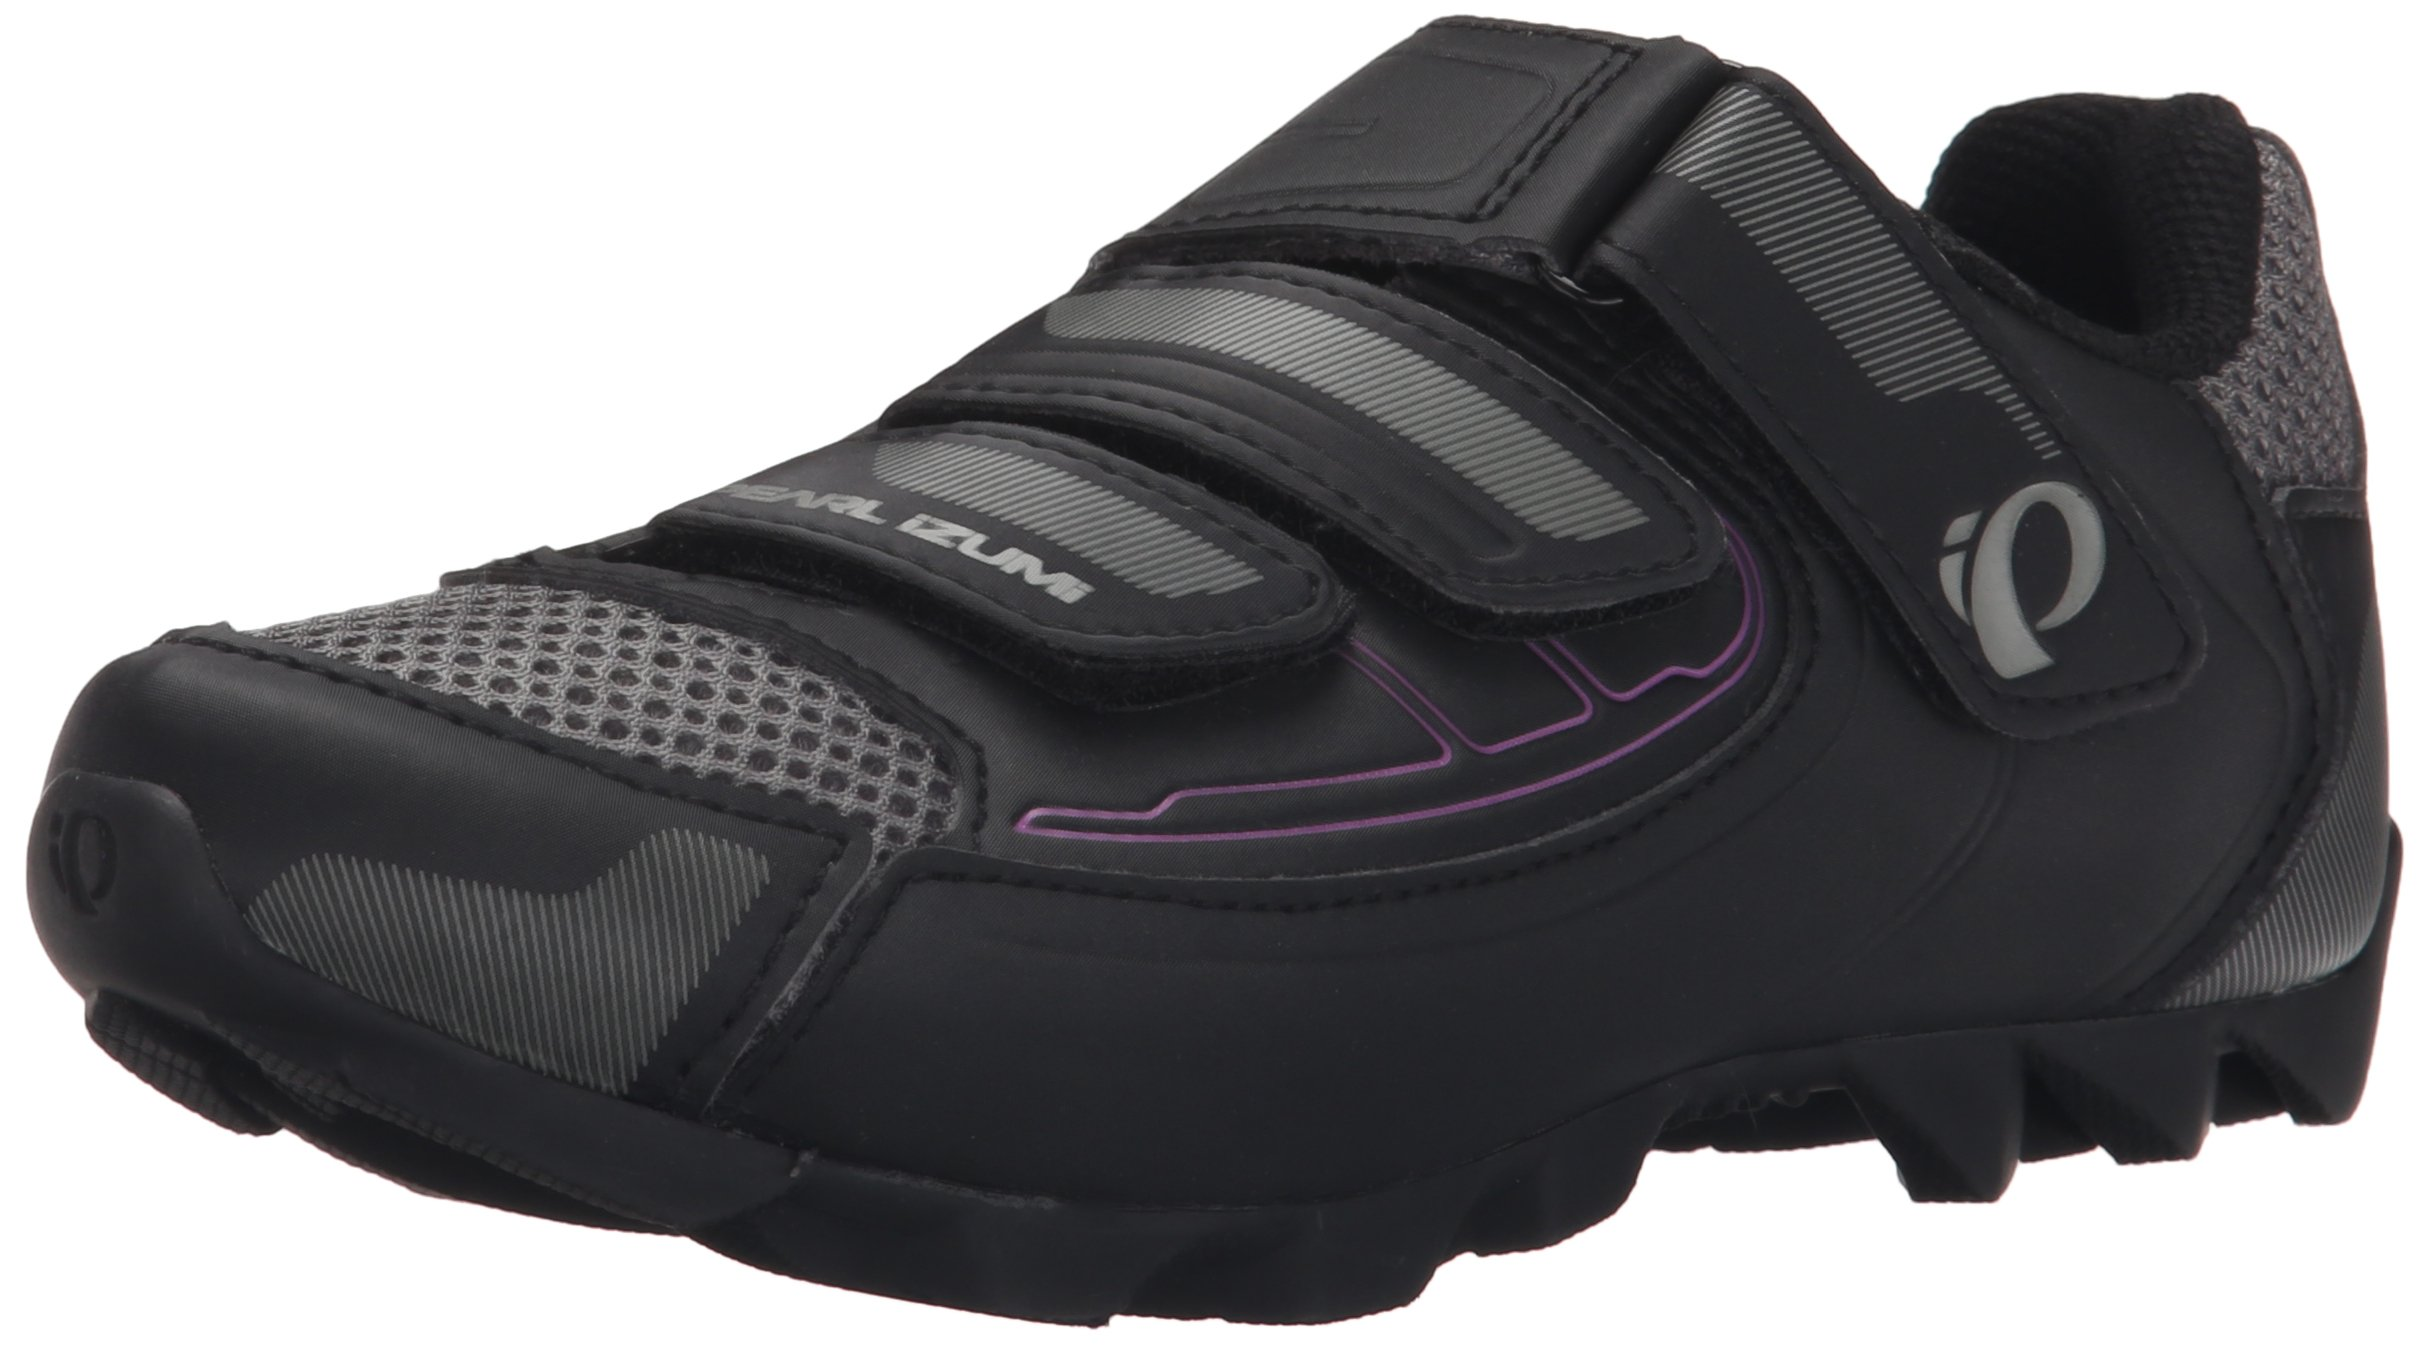 Pearl Izumi Women's W All-road Iii B/b Cycling Shoe, Black/Black, 43 EU/10.8 B US